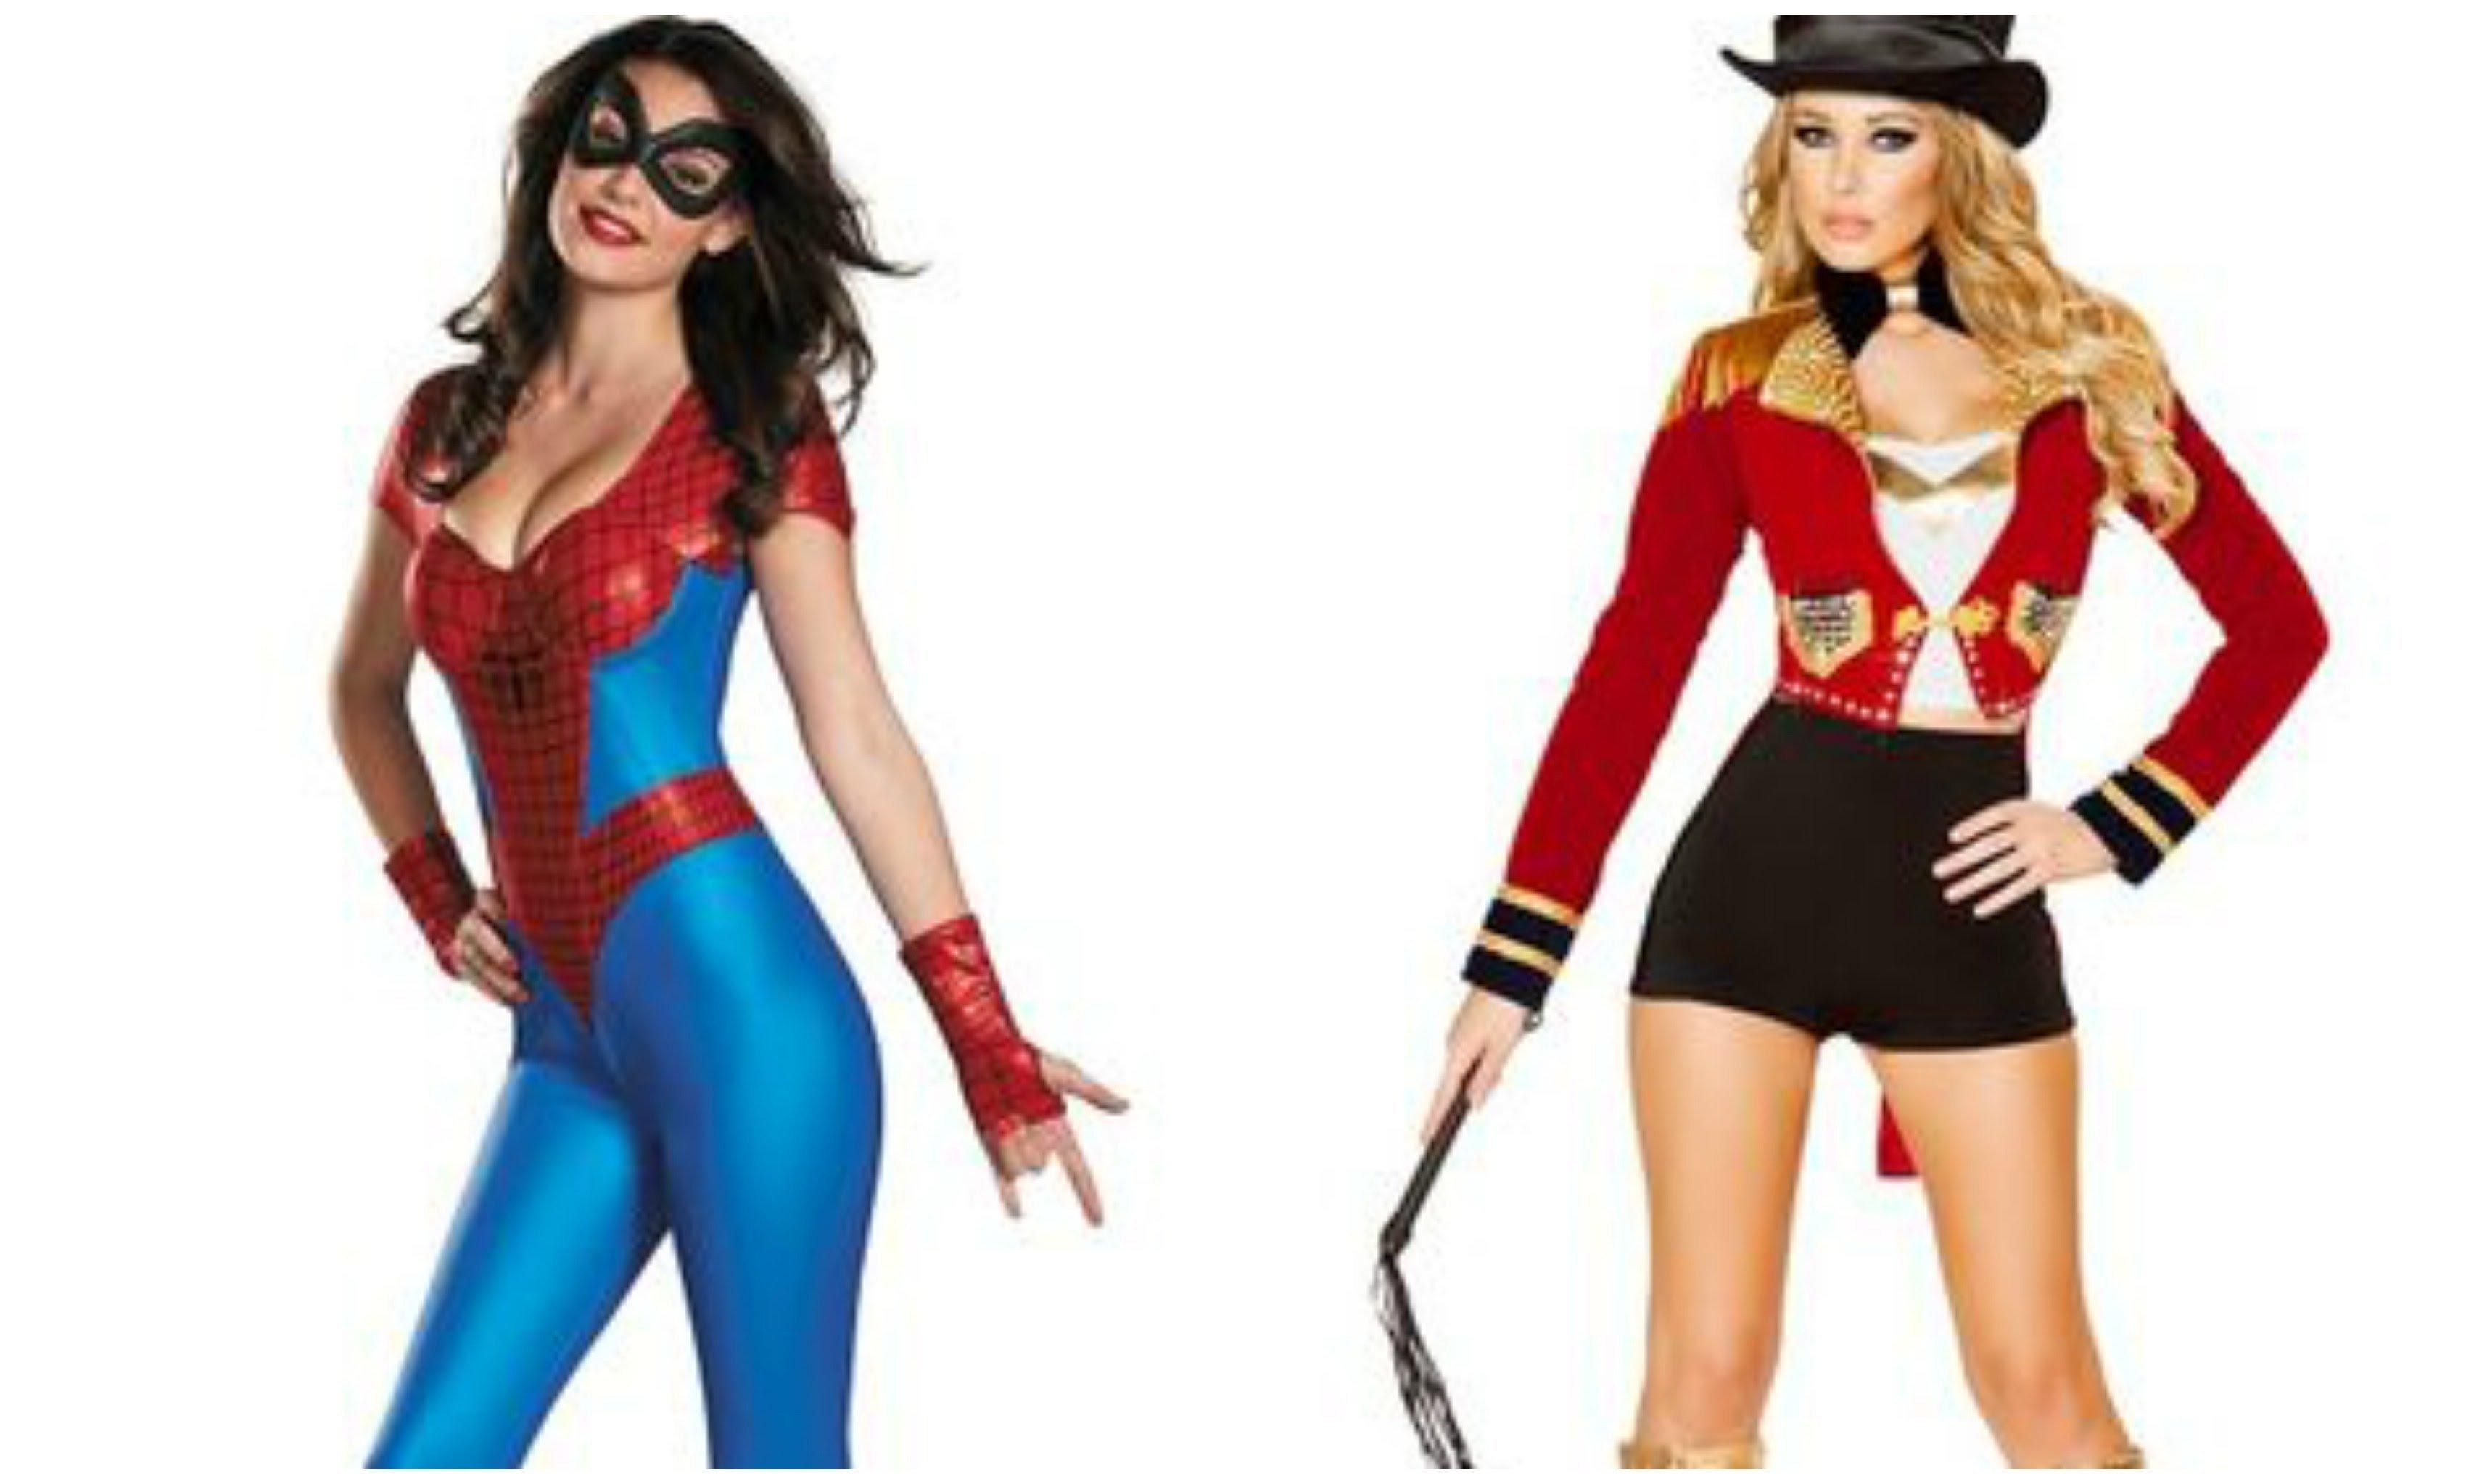 61 costume ideas for, good halloween costume ideas - samorzady